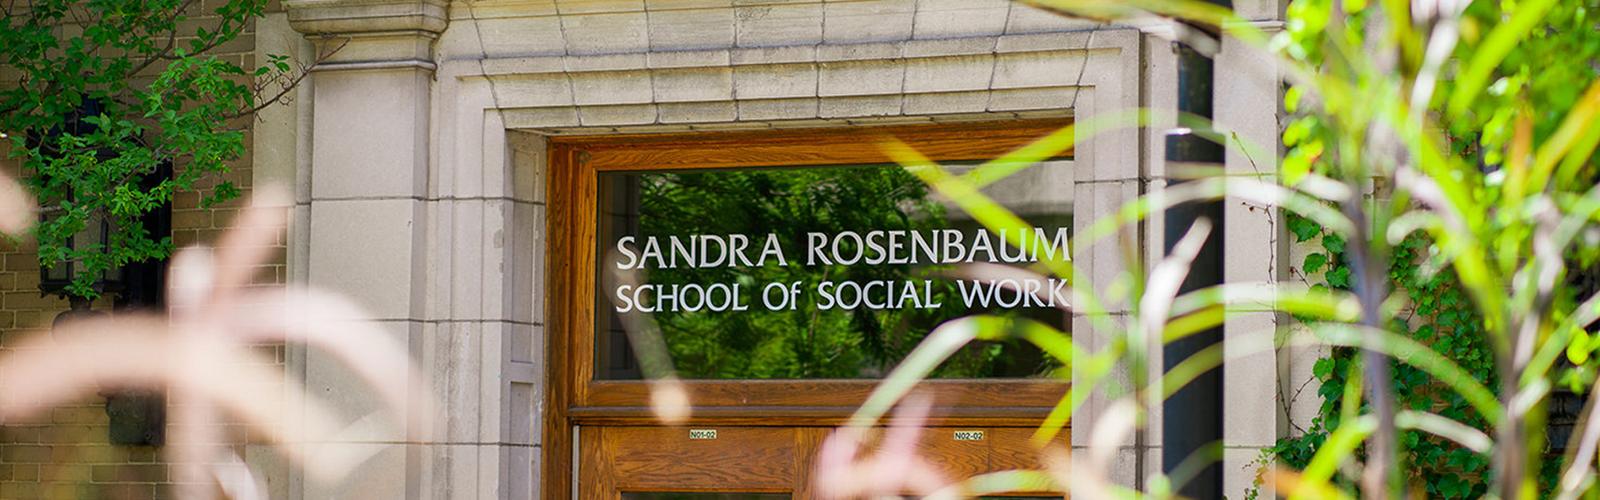 Photo of entrance with name: Sandra Rosenbaum School of Social Work stenciled on door